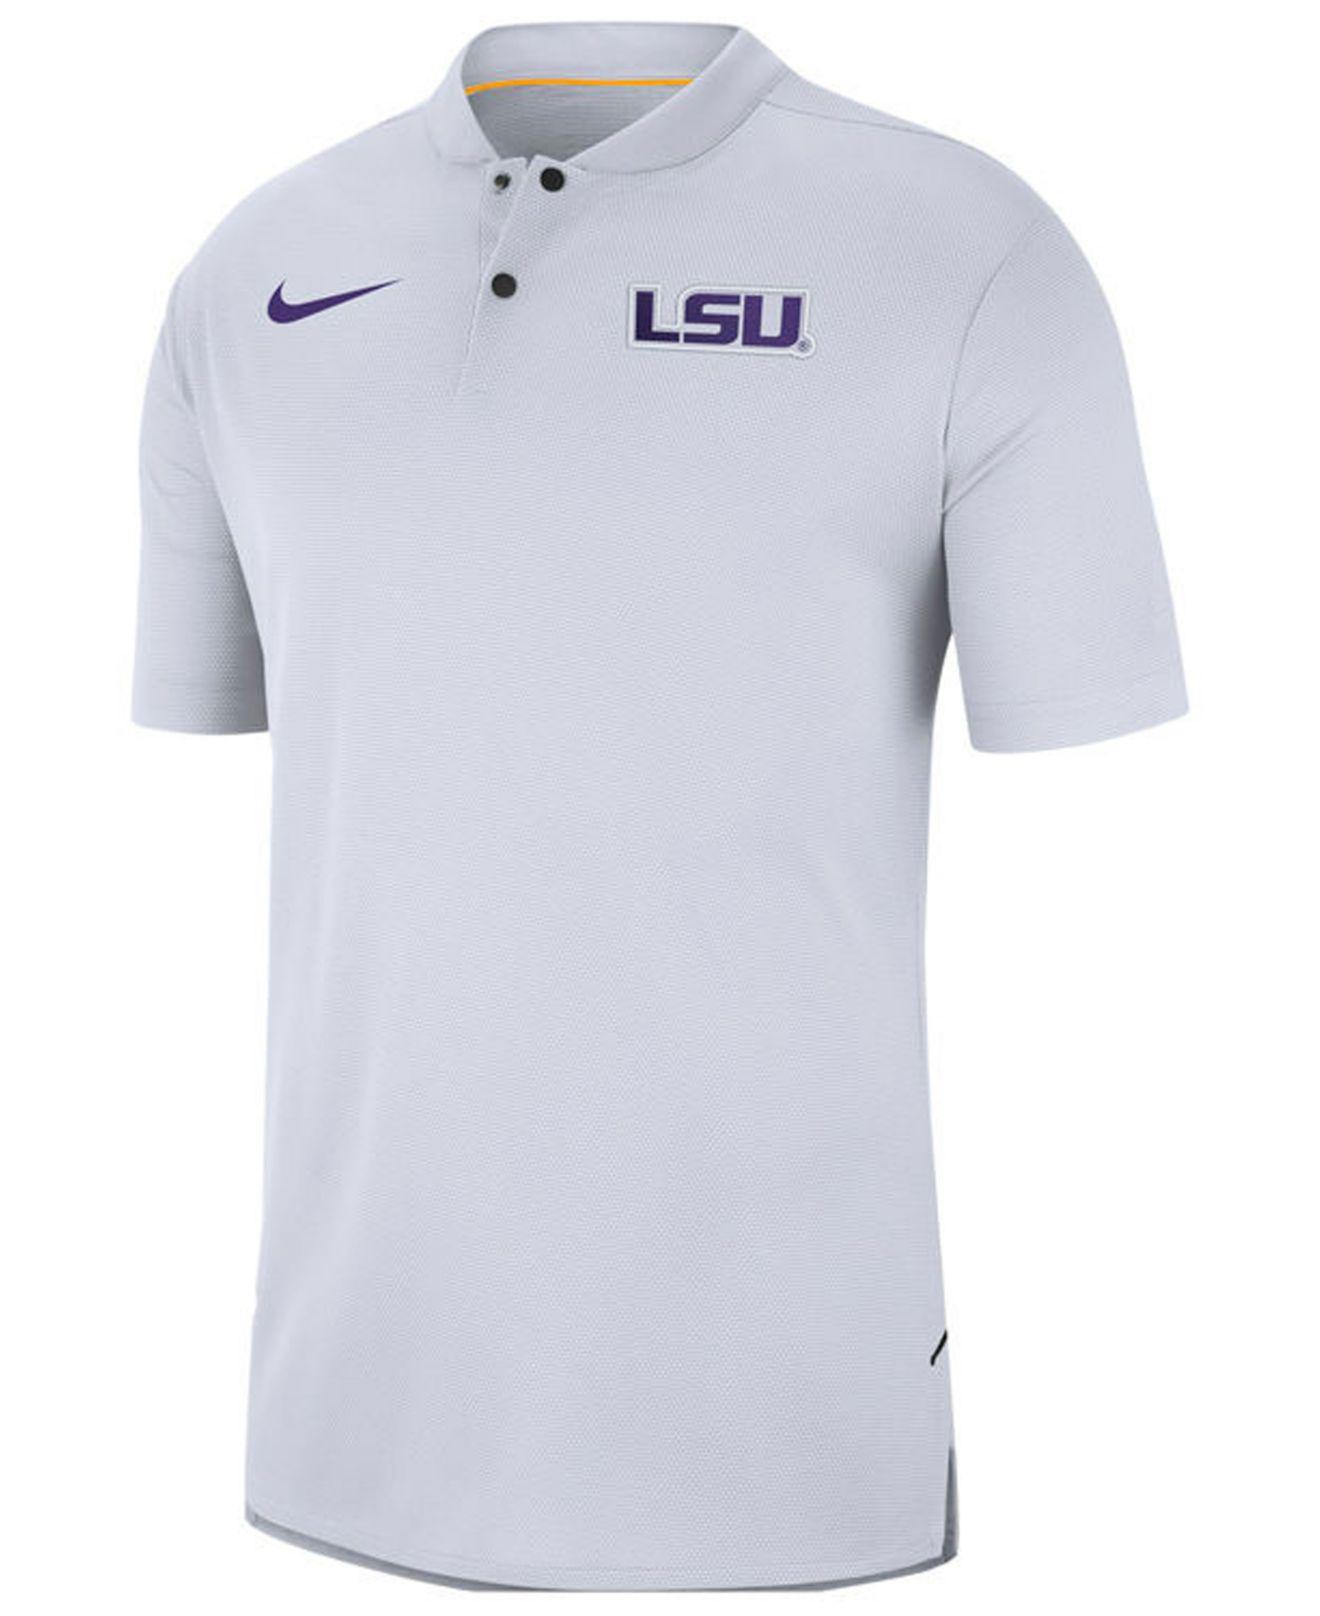 Lyst - Nike Lsu Tigers Elite Coaches Polo 2018 in White for Men 1cc4e293f